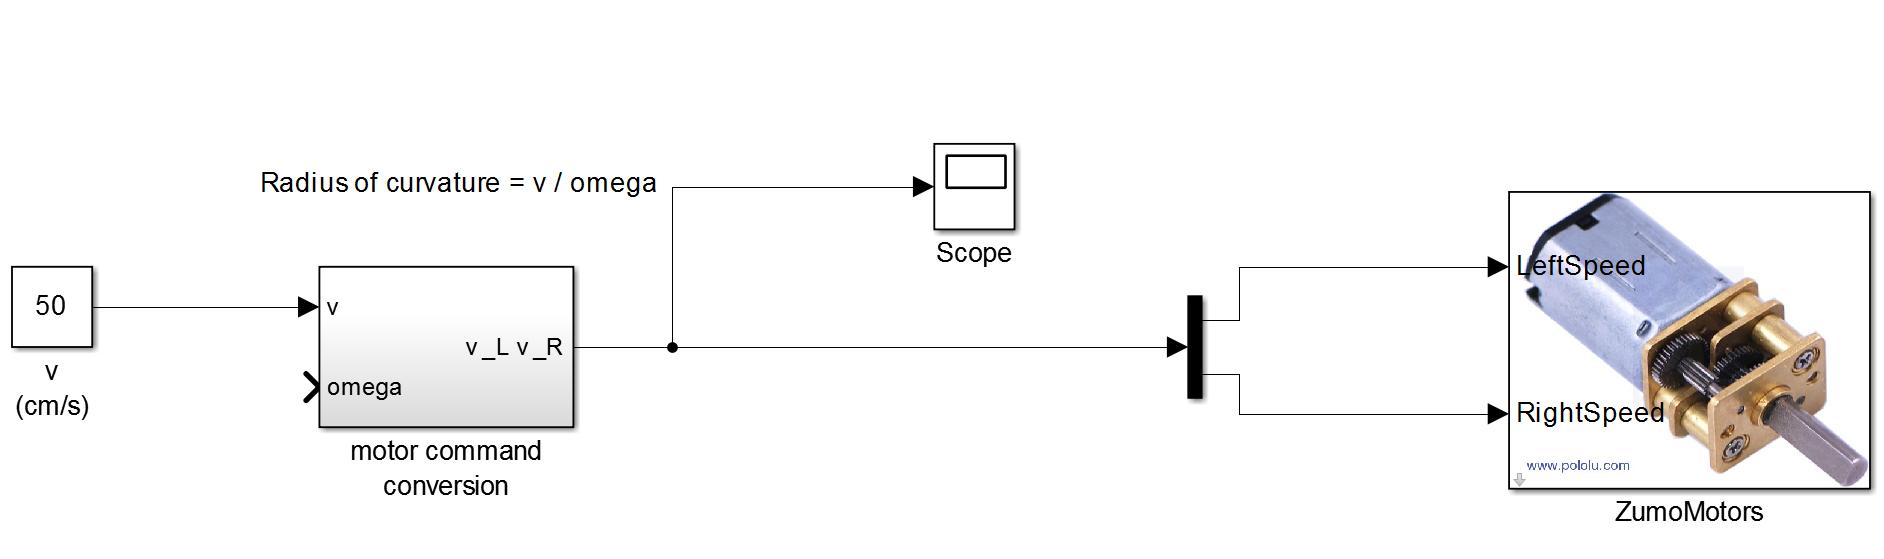 learn_arduino_ModelConversionLineFollowe.png